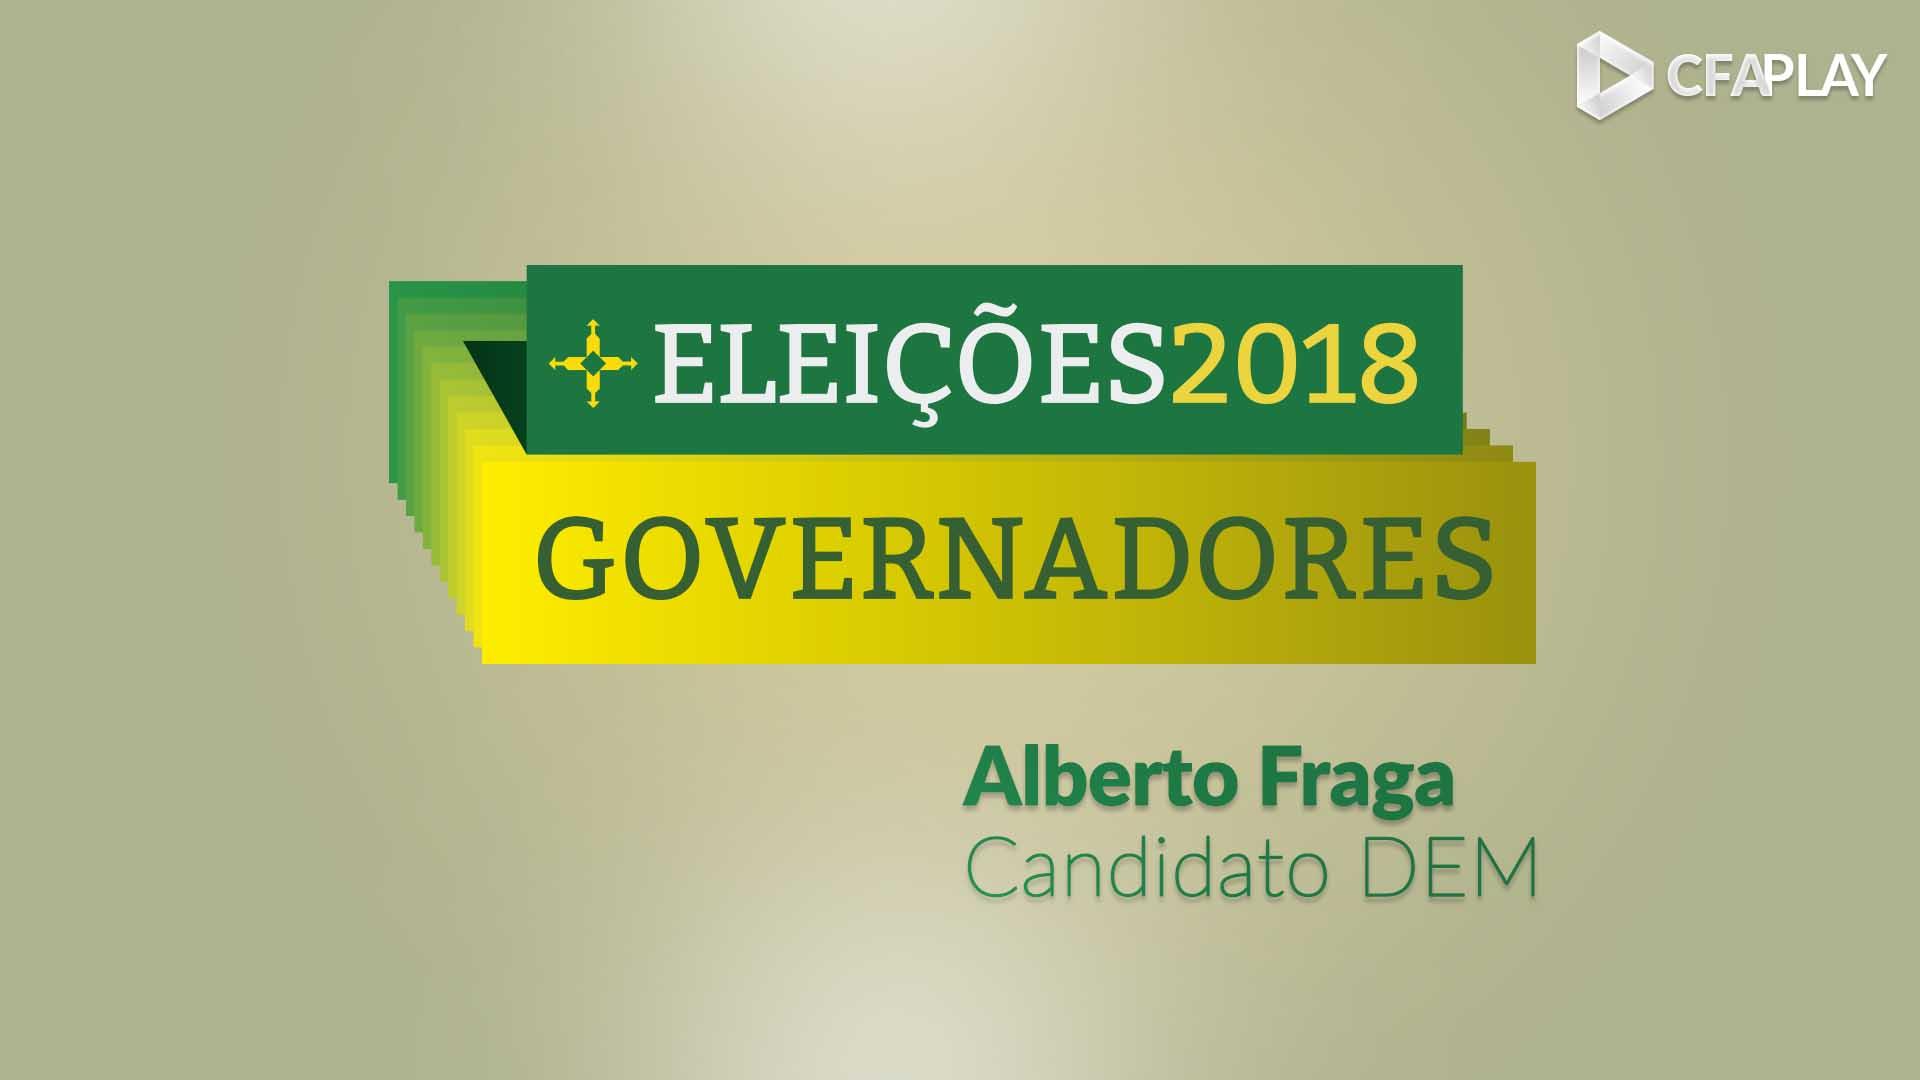 Governadores GDF 2018: Análise do candidato Alberto Fraga (DEM)